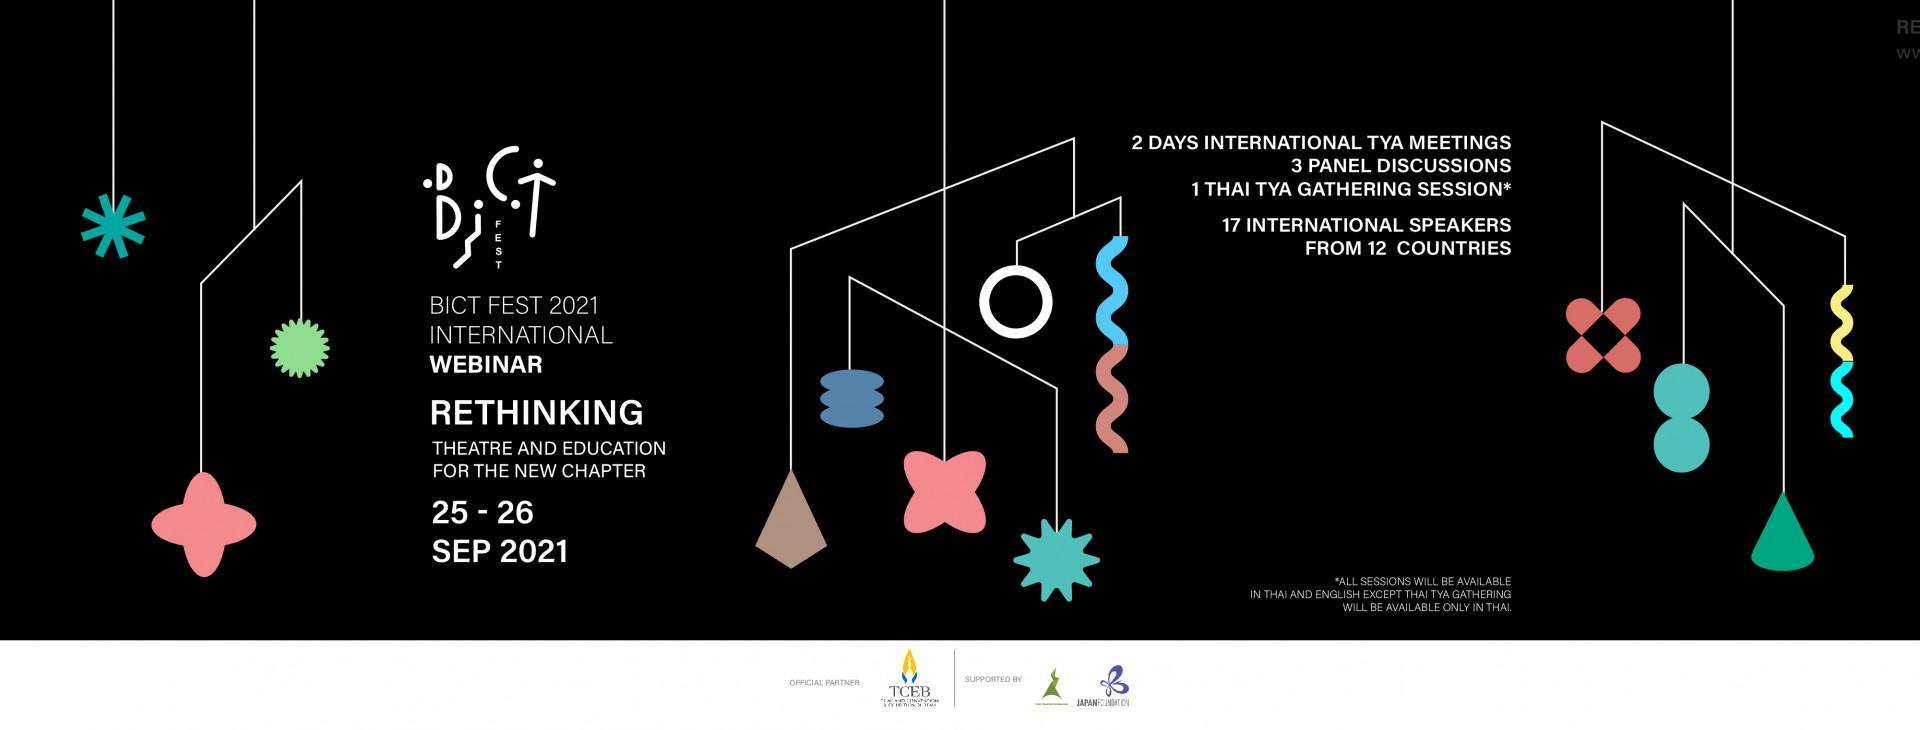 BICT Fest 2021 International Webinar